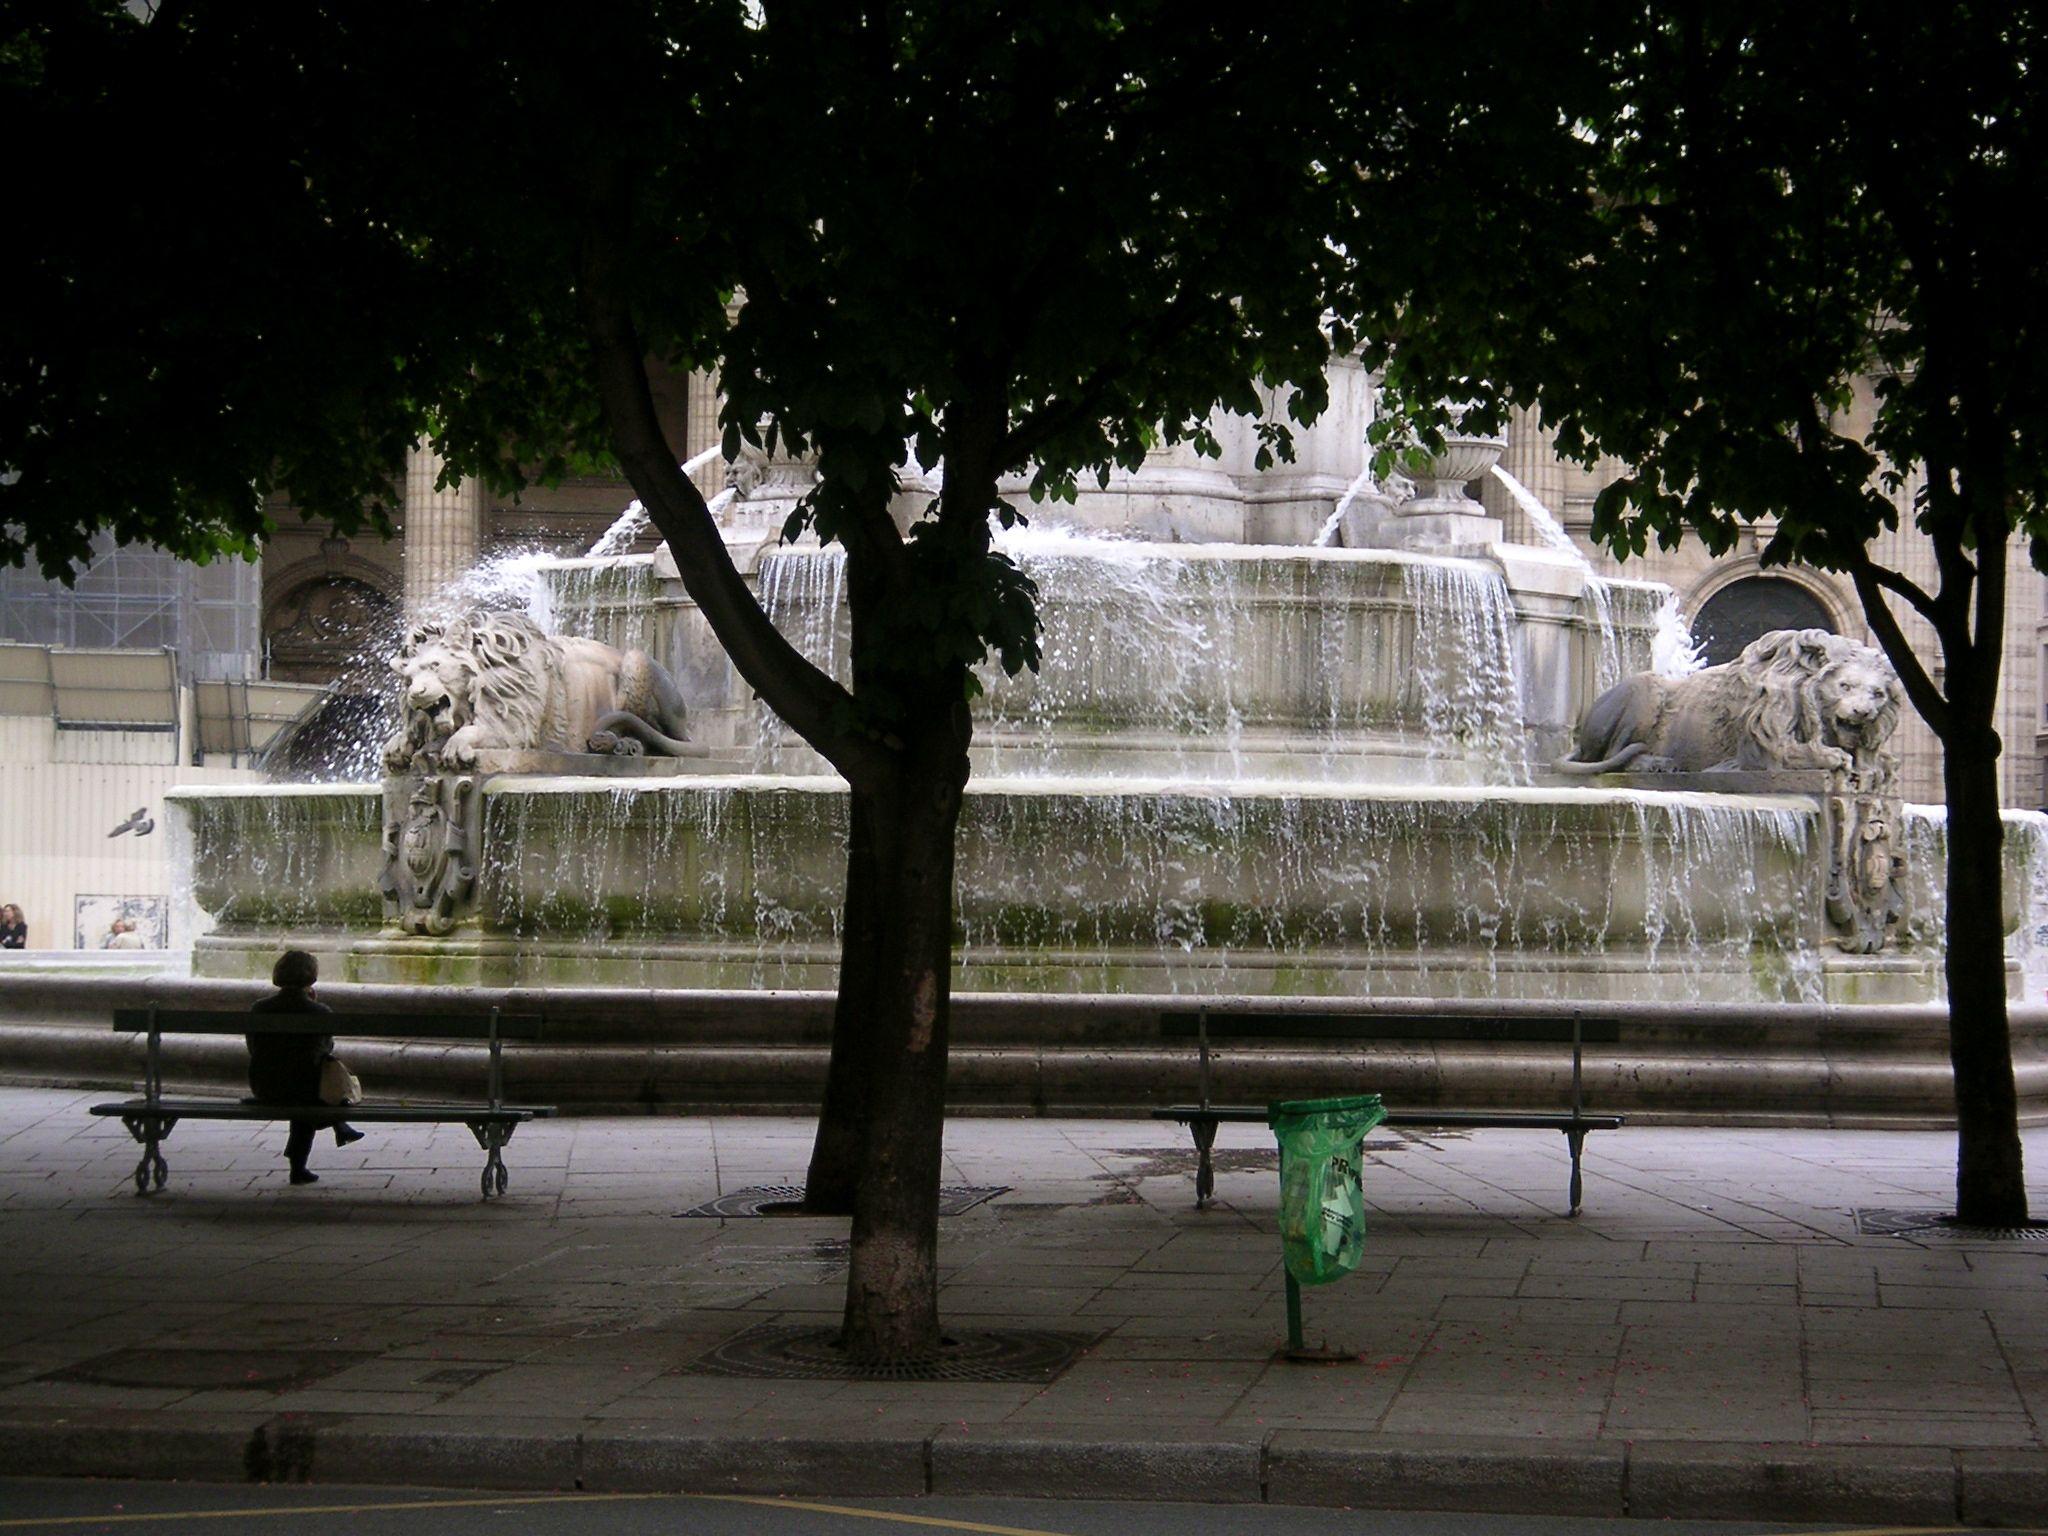 fountain across from Saint Sulpice church in #Paris